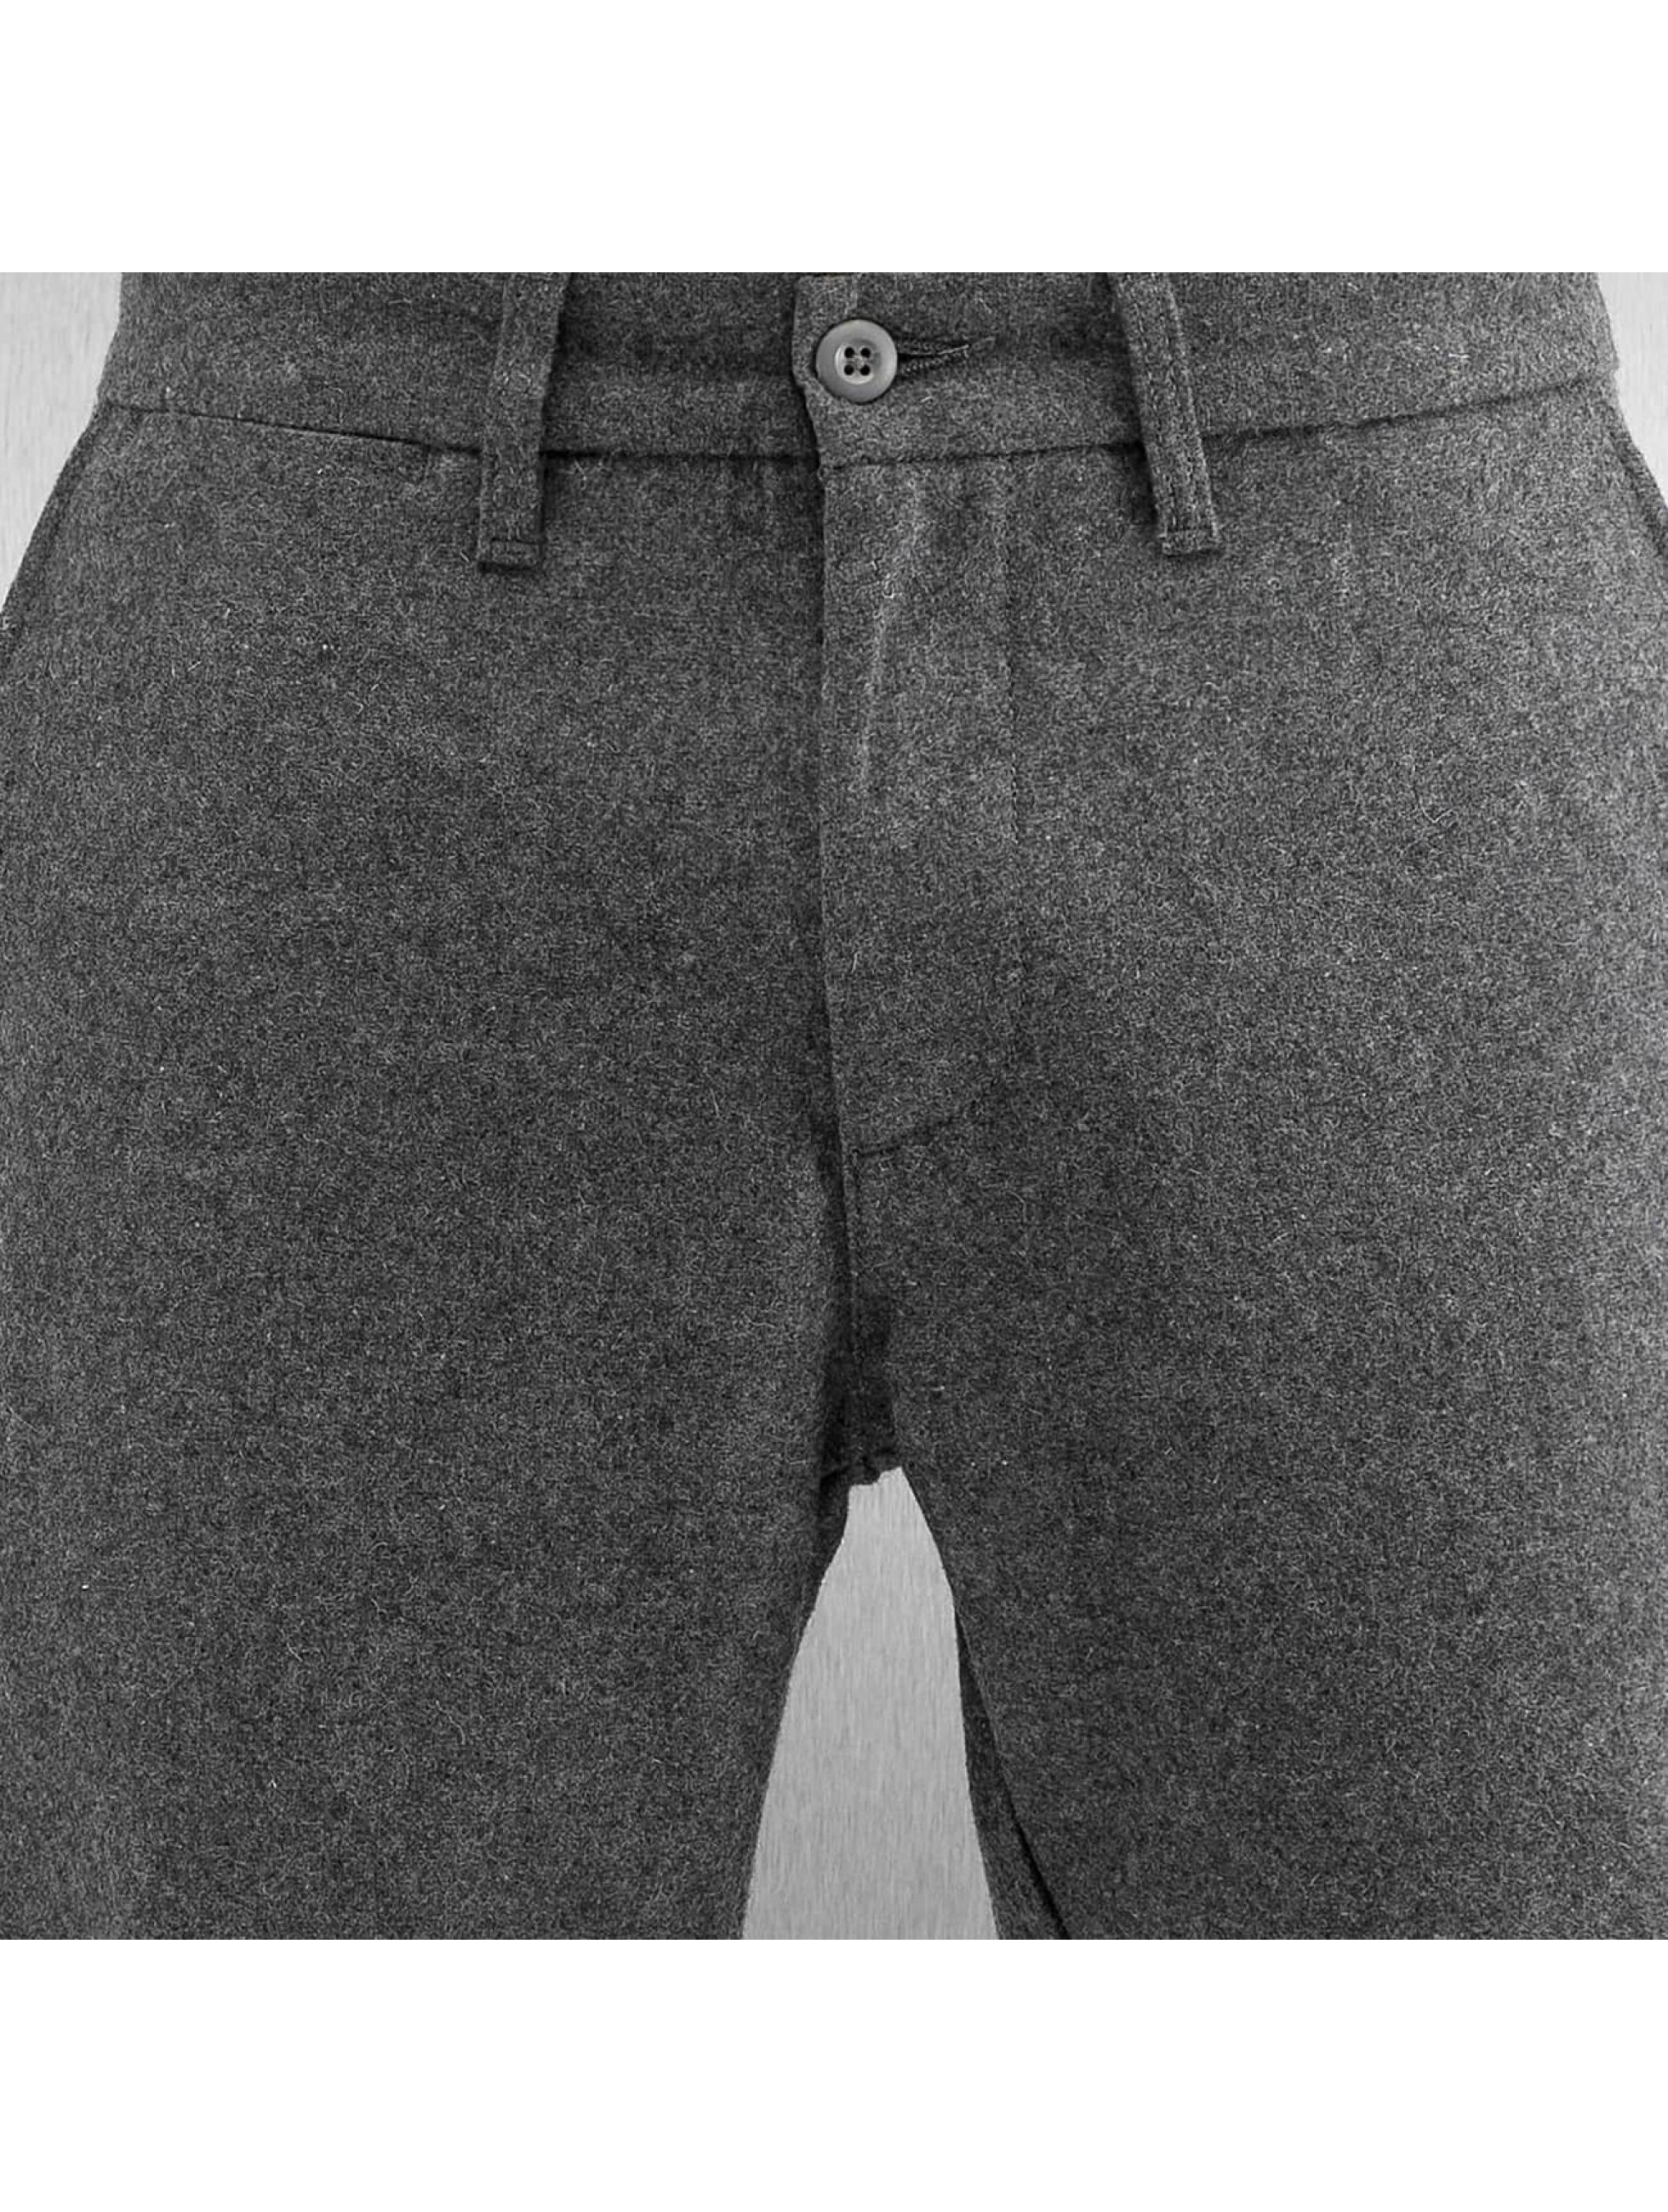 Carhartt WIP Chino pants Southbury Johnson gray